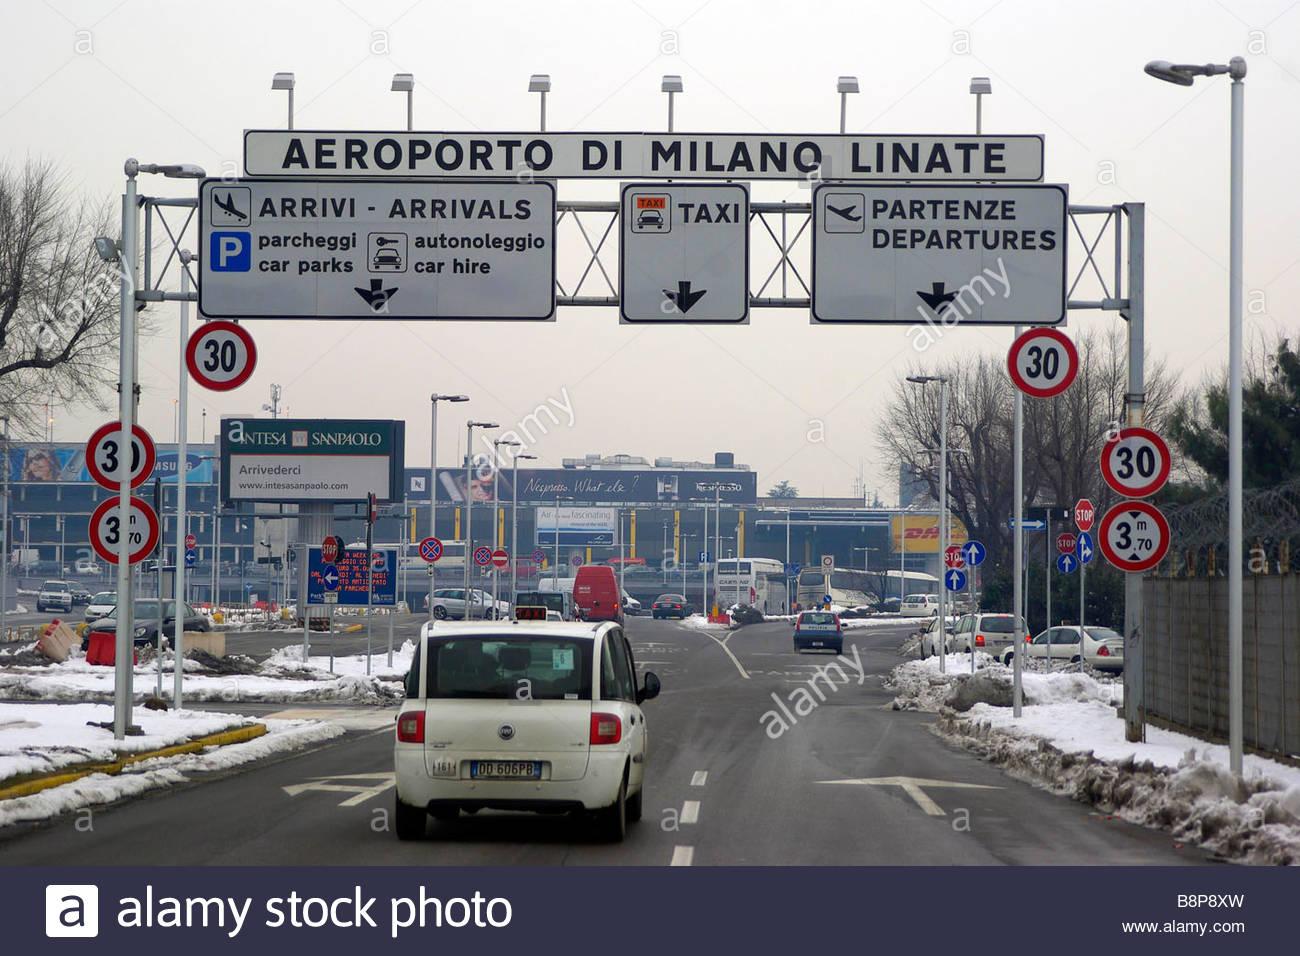 linate airport'milano 14-01-2009  'photo marco becker/markanews - Stock Image